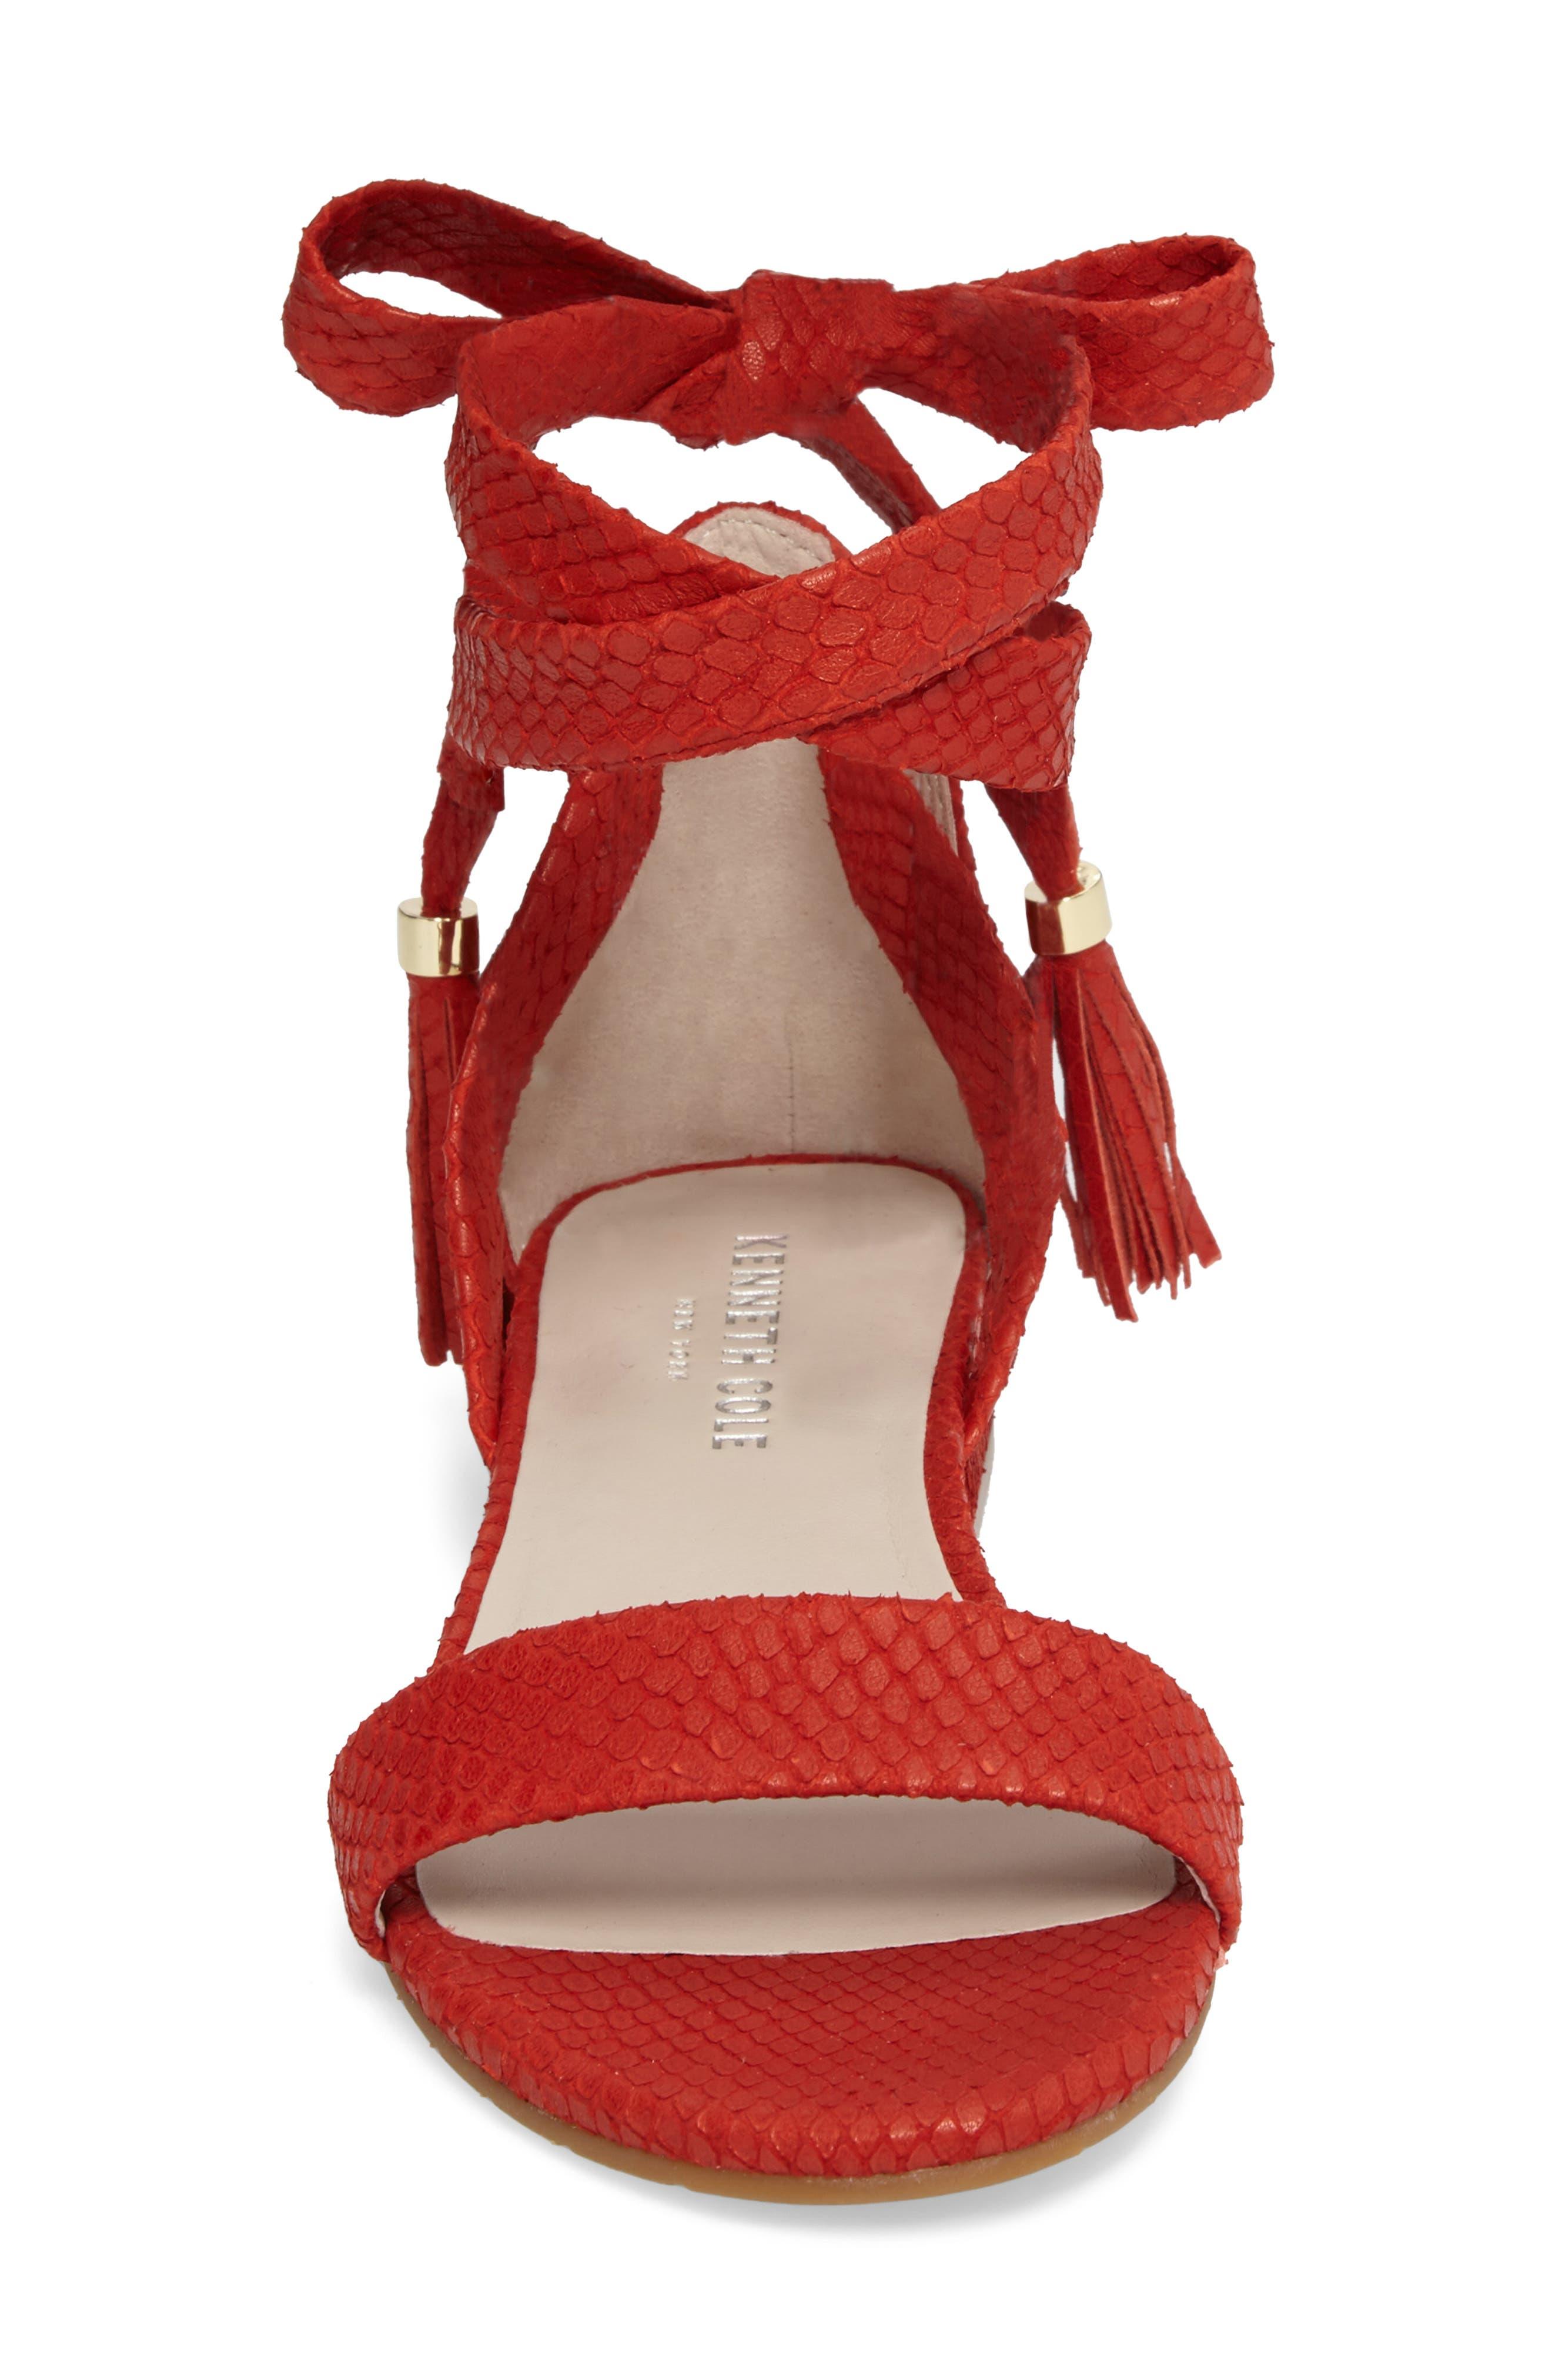 Valen Tassel Lace-Up Sandal,                             Alternate thumbnail 52, color,